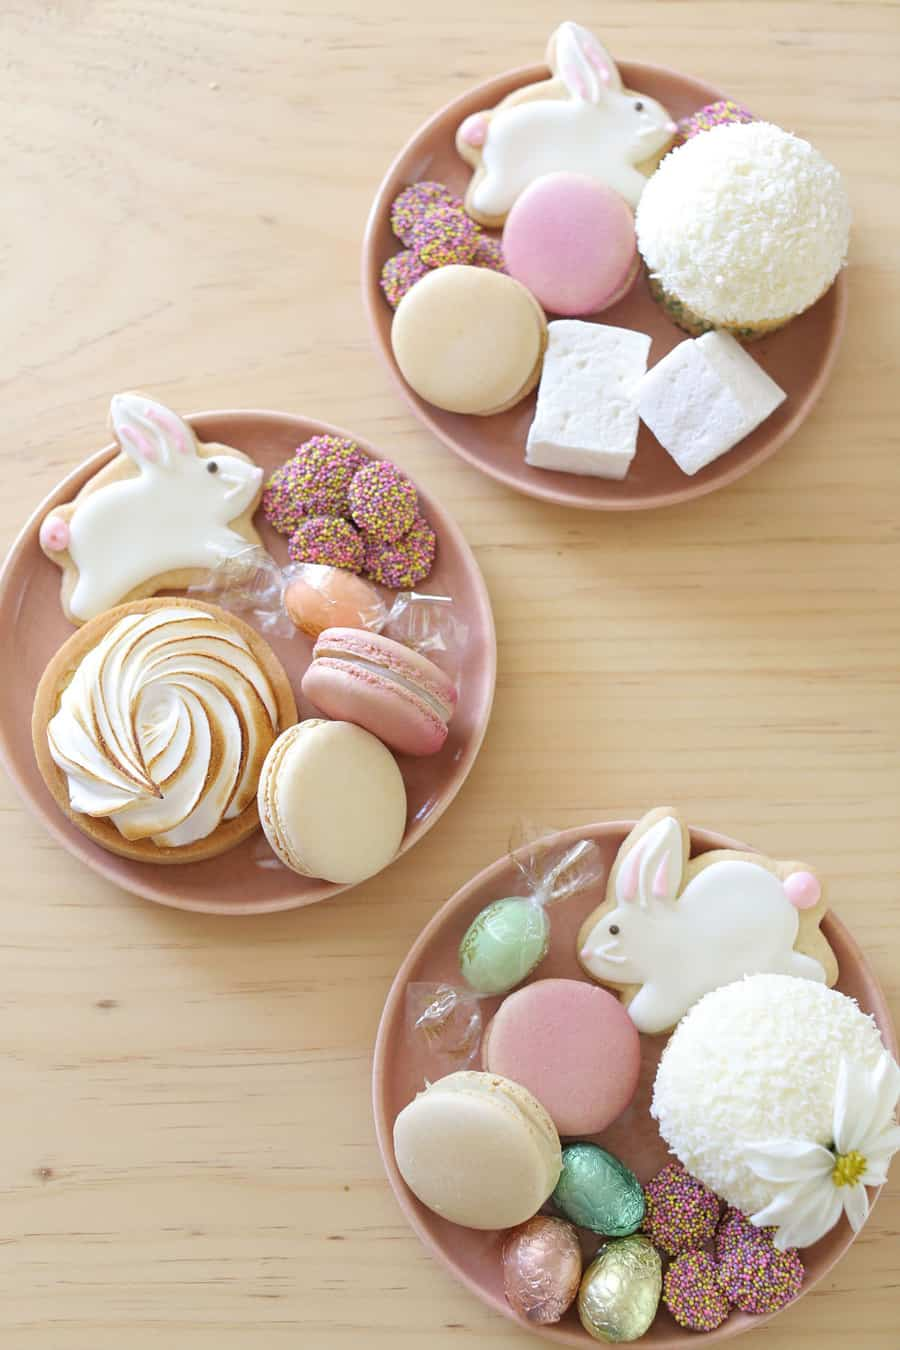 Easter desserts on pink plates